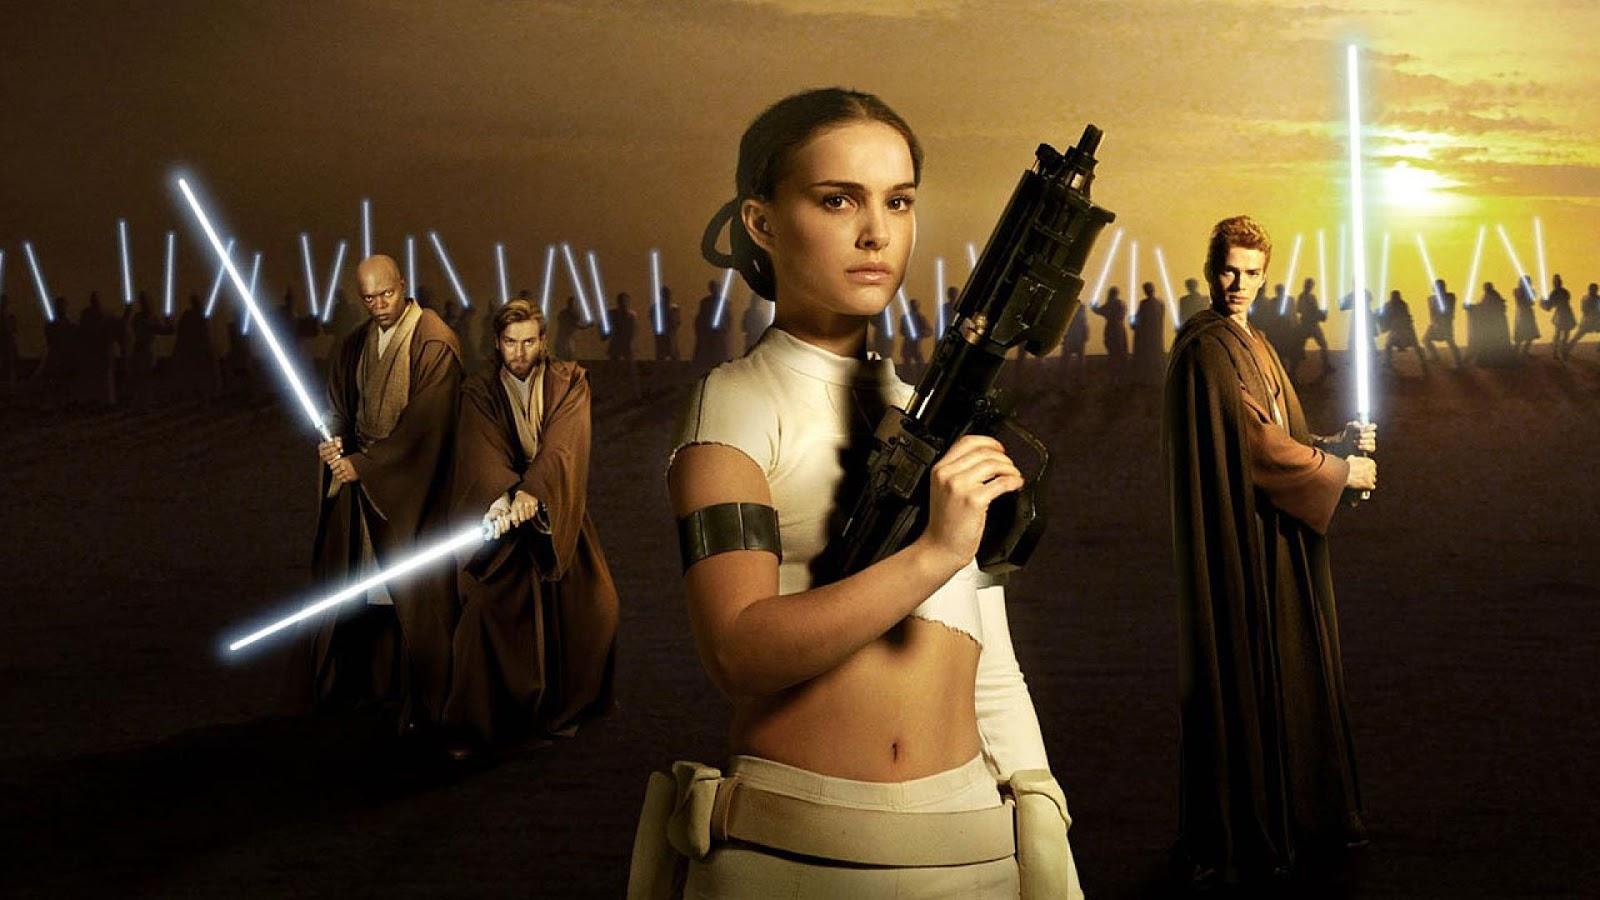 Star Wars Natalie Portman Wallpaper